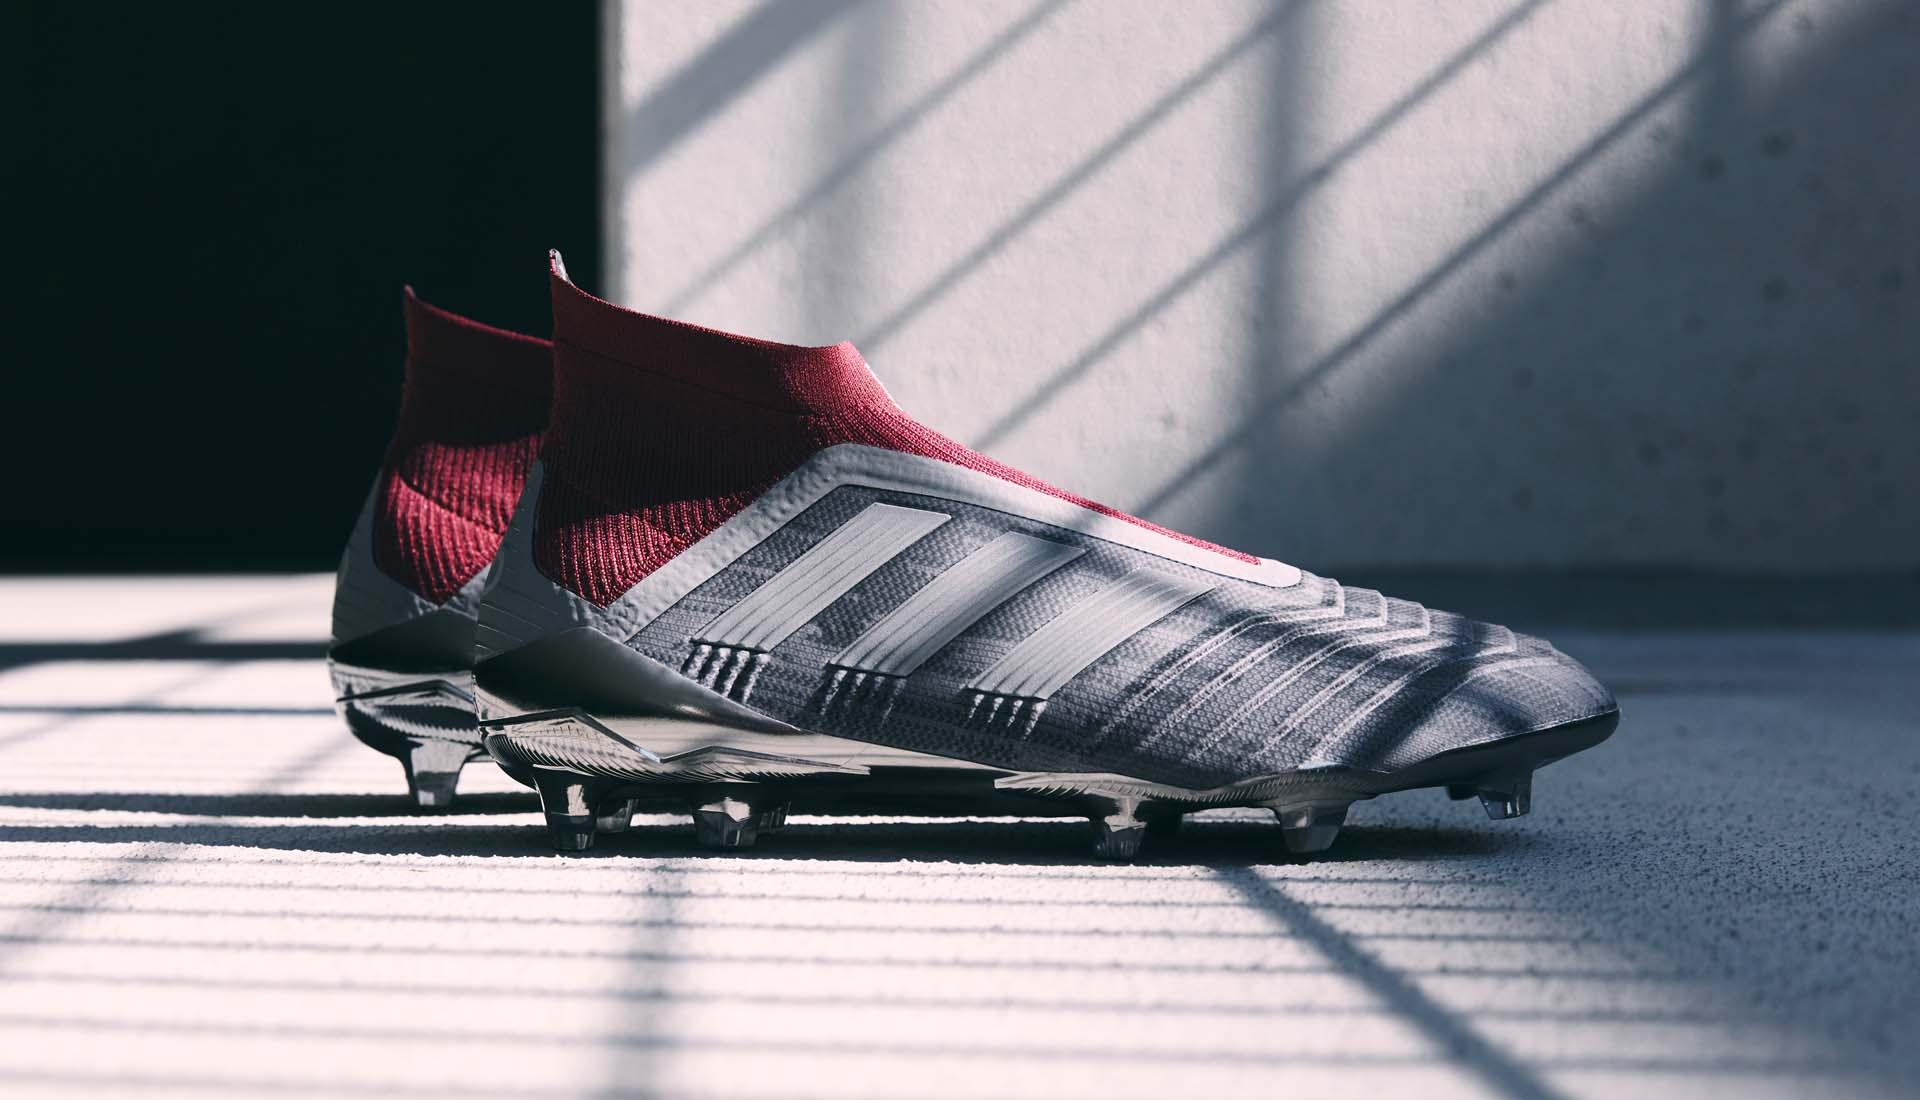 chaussures de foot adidas Predator 18 Paul Pogba 2018